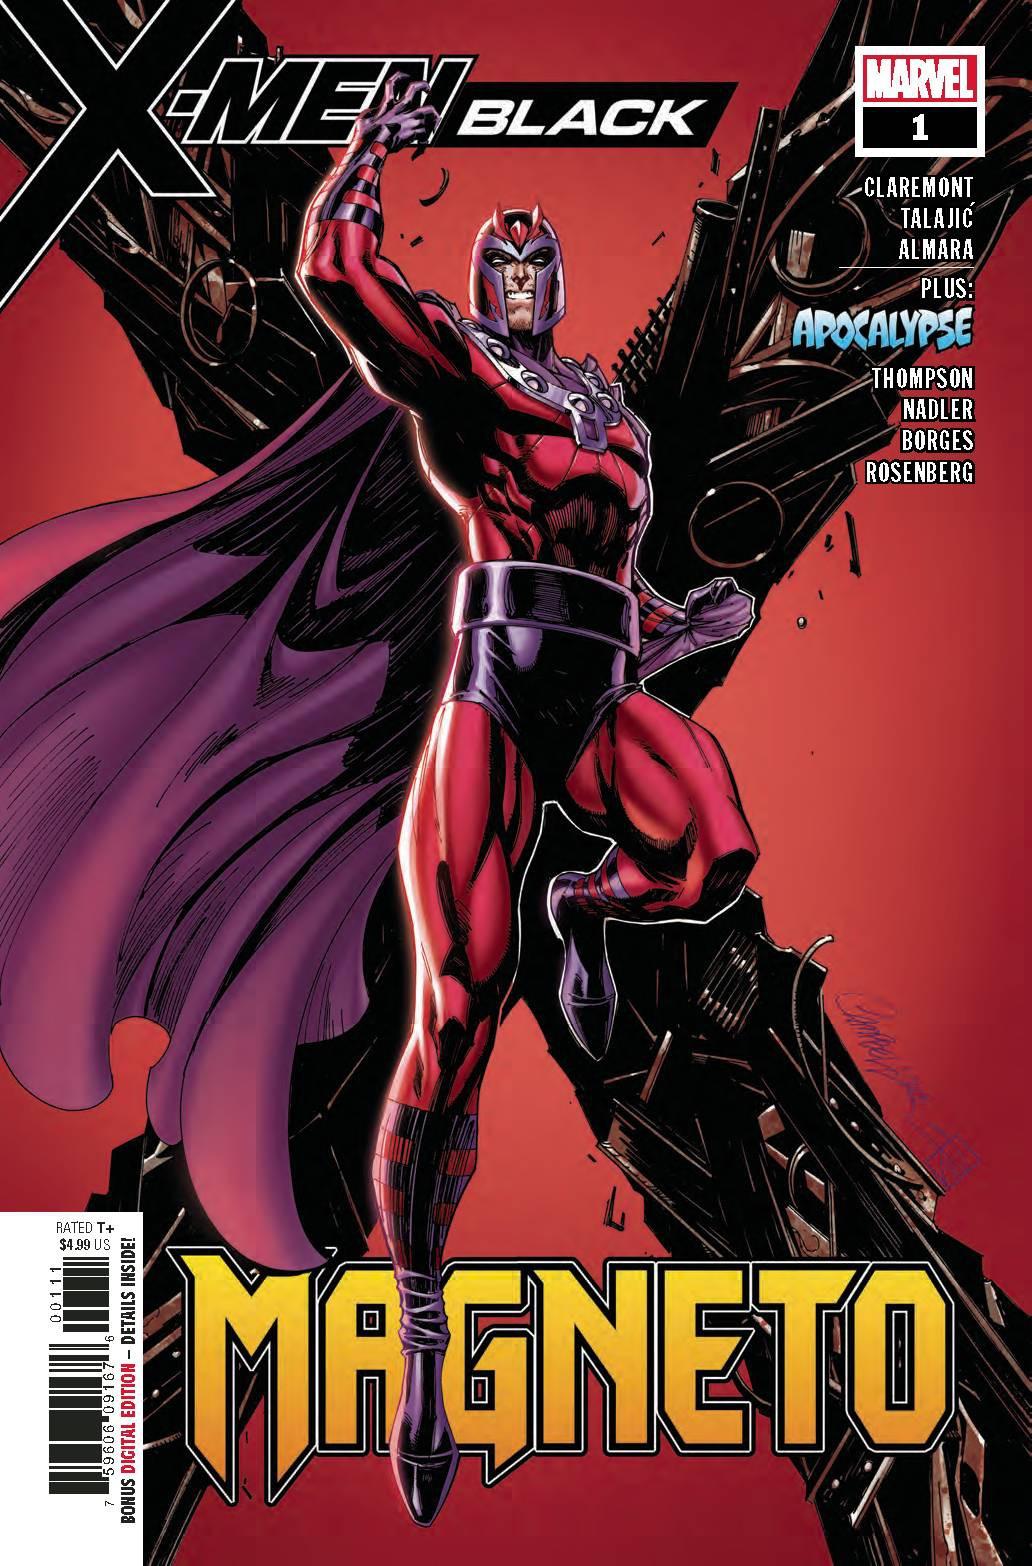 Marvel X-Men Black #1 Magneto by